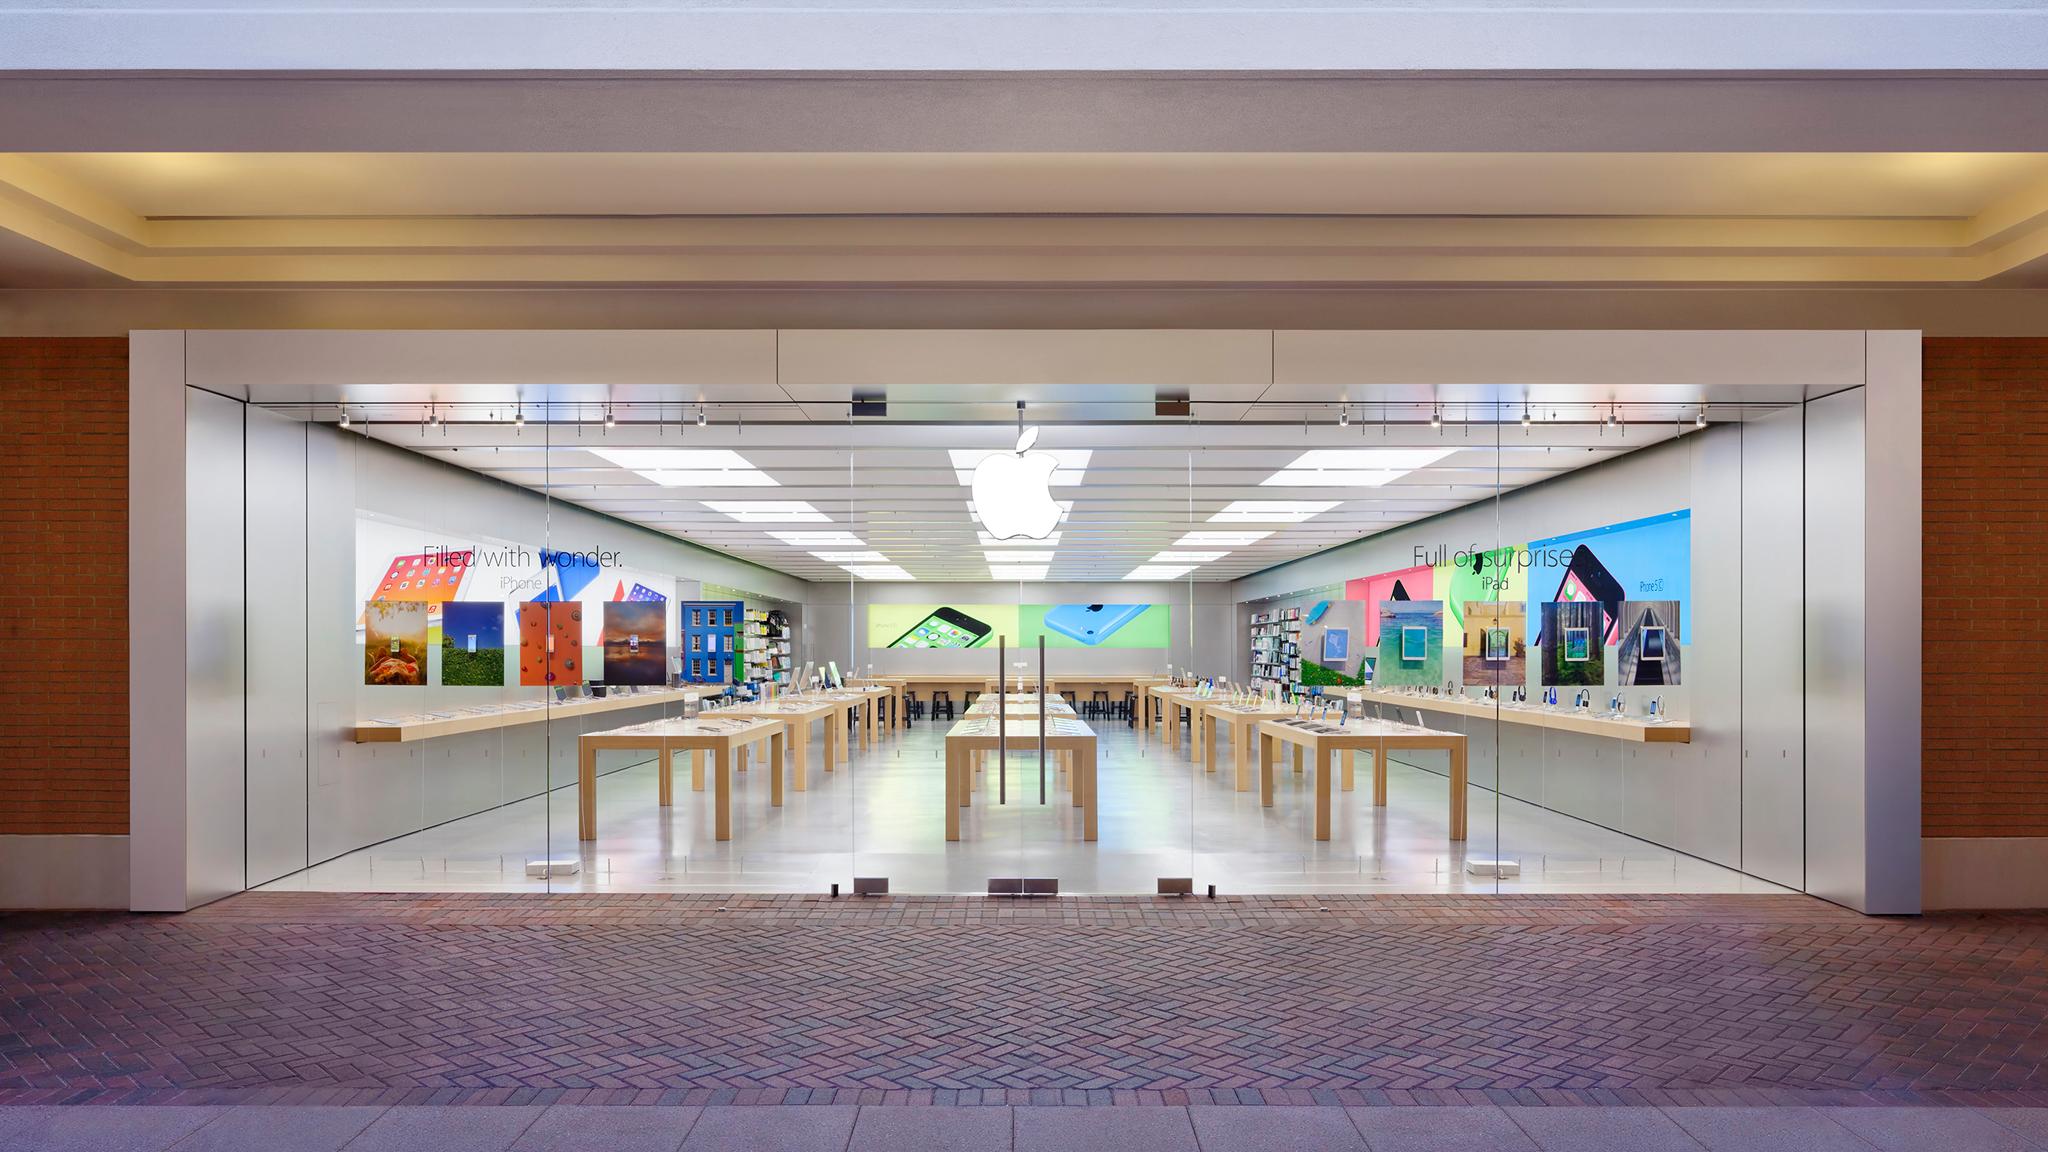 Apple Short Pump Town Center image 0